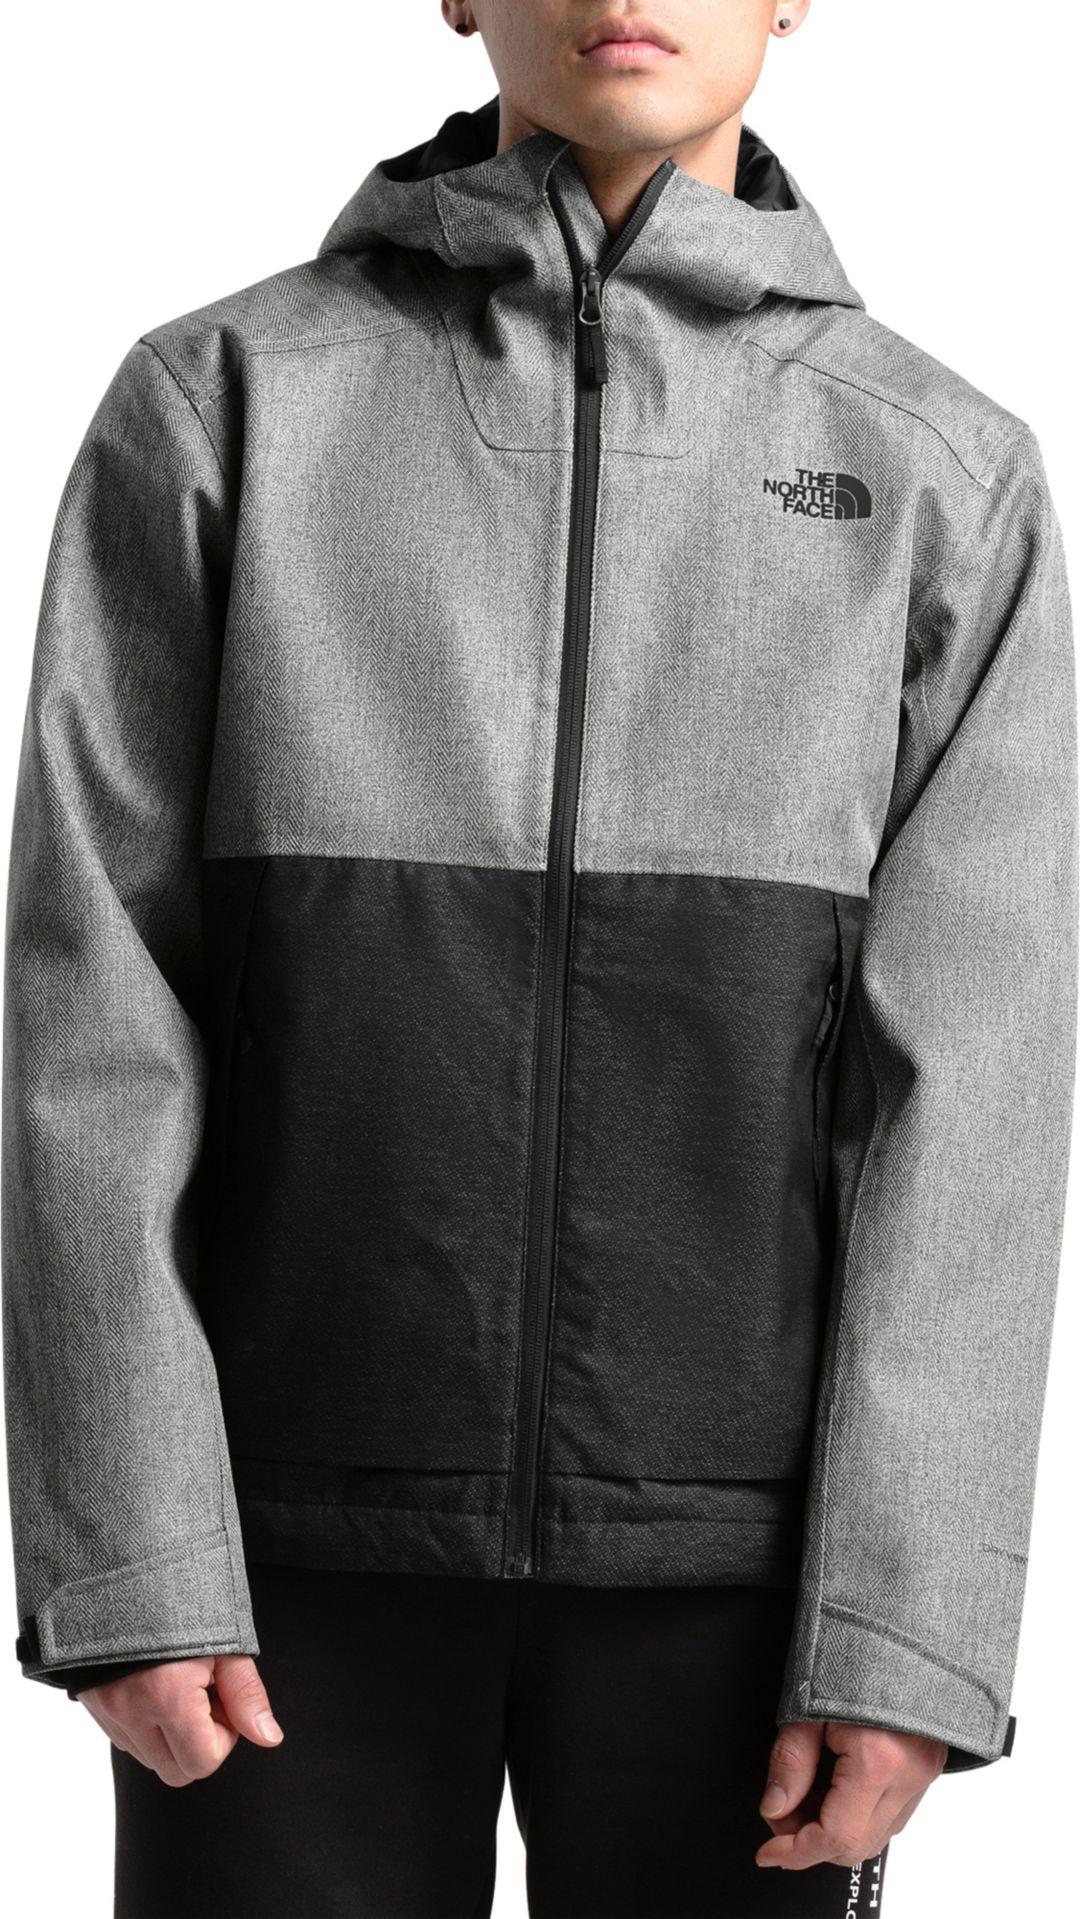 3b557e4ac The North Face Men's Millerton Rain Jacket